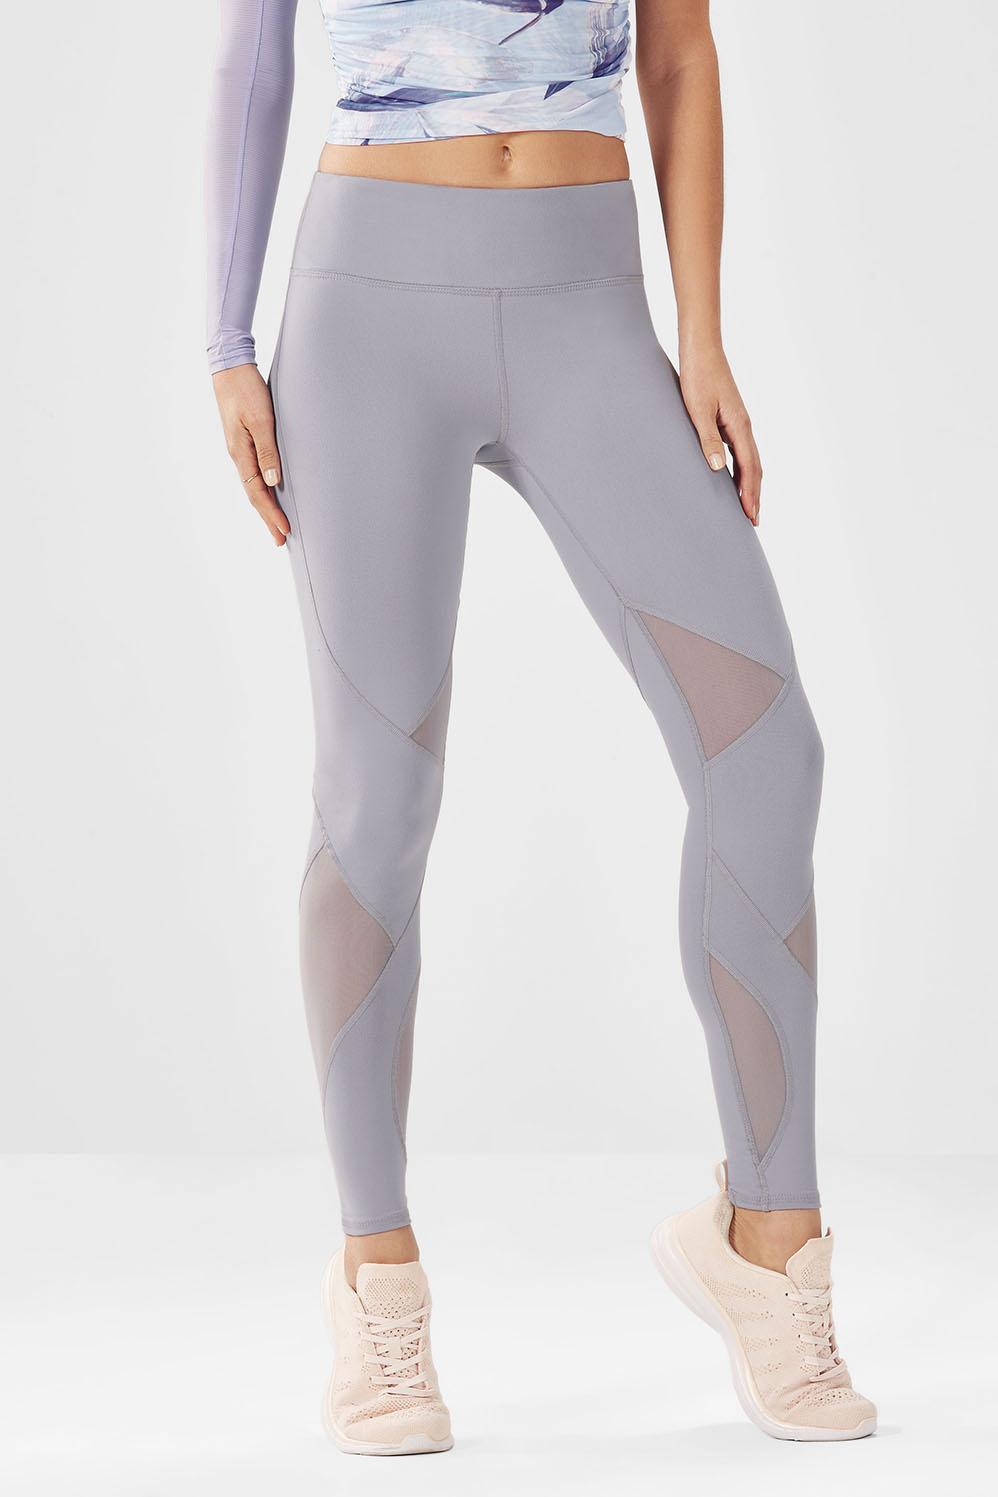 Fabletics Tight Salar Mesh Powerhold Legging Womens Pebble Size XL